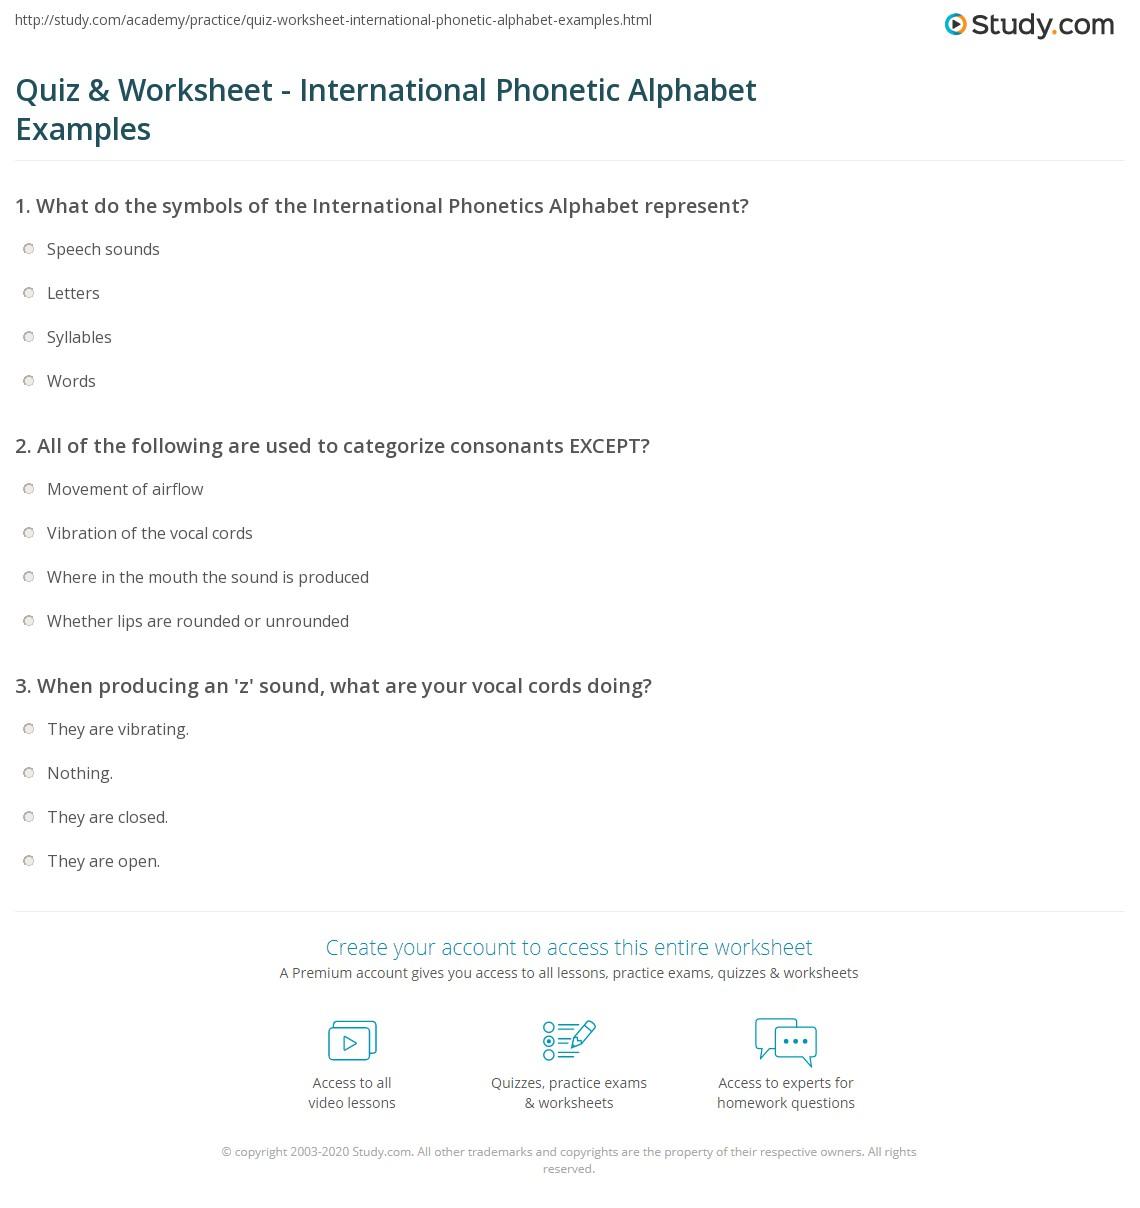 Quiz & Worksheet - International Phonetic Alphabet Examples  grade worksheets, math worksheets, education, multiplication, alphabet worksheets, and learning Phonetic Alphabet Worksheet 1415 x 1140